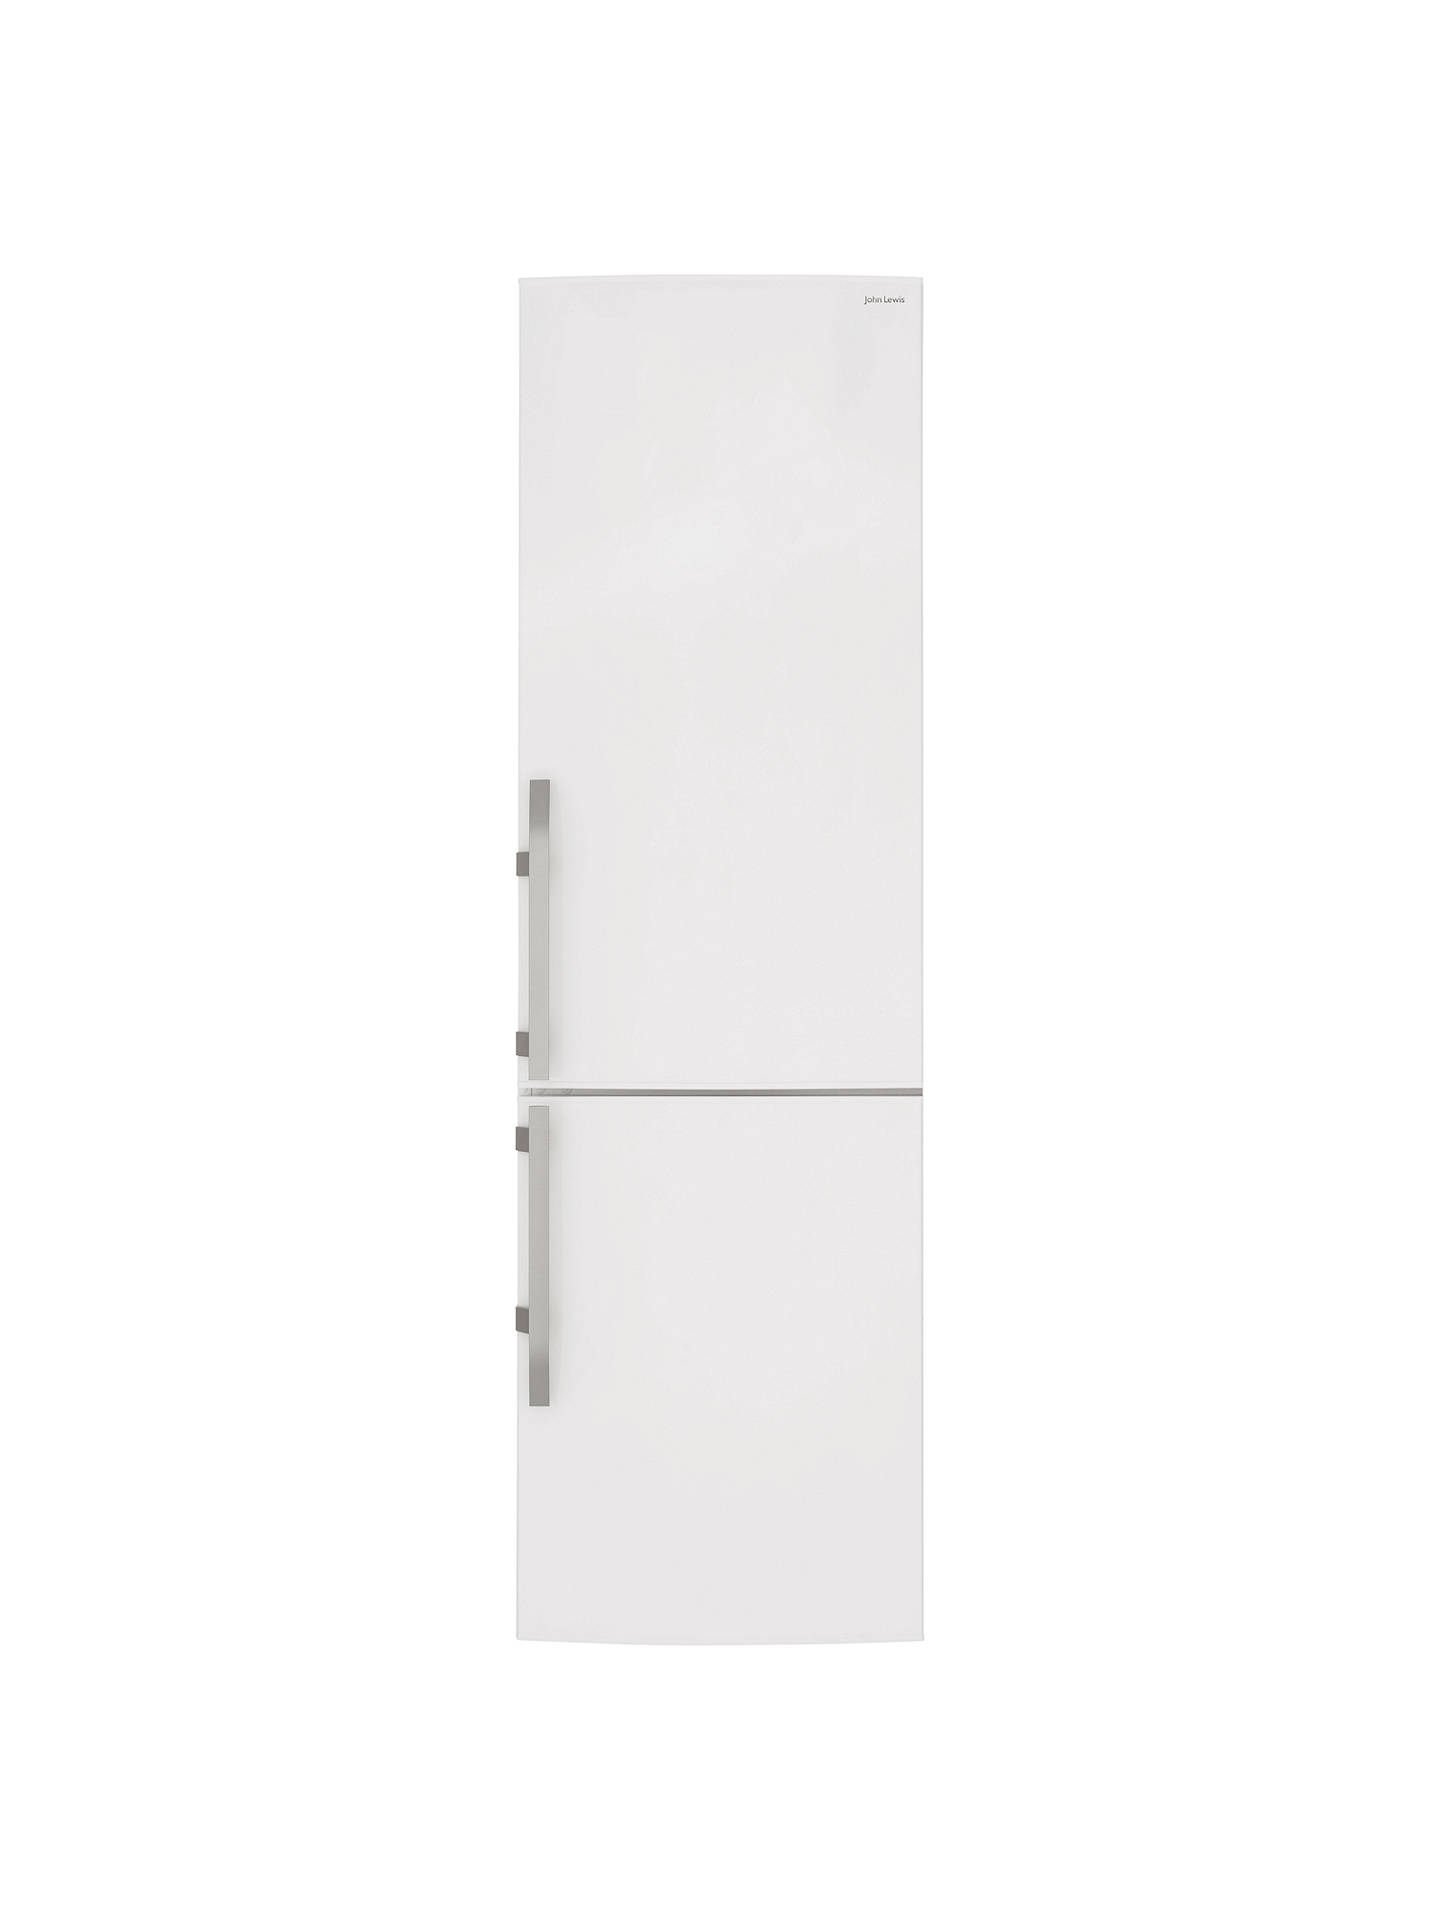 john lewis partners jlffw2019 fridge freezer a energy. Black Bedroom Furniture Sets. Home Design Ideas